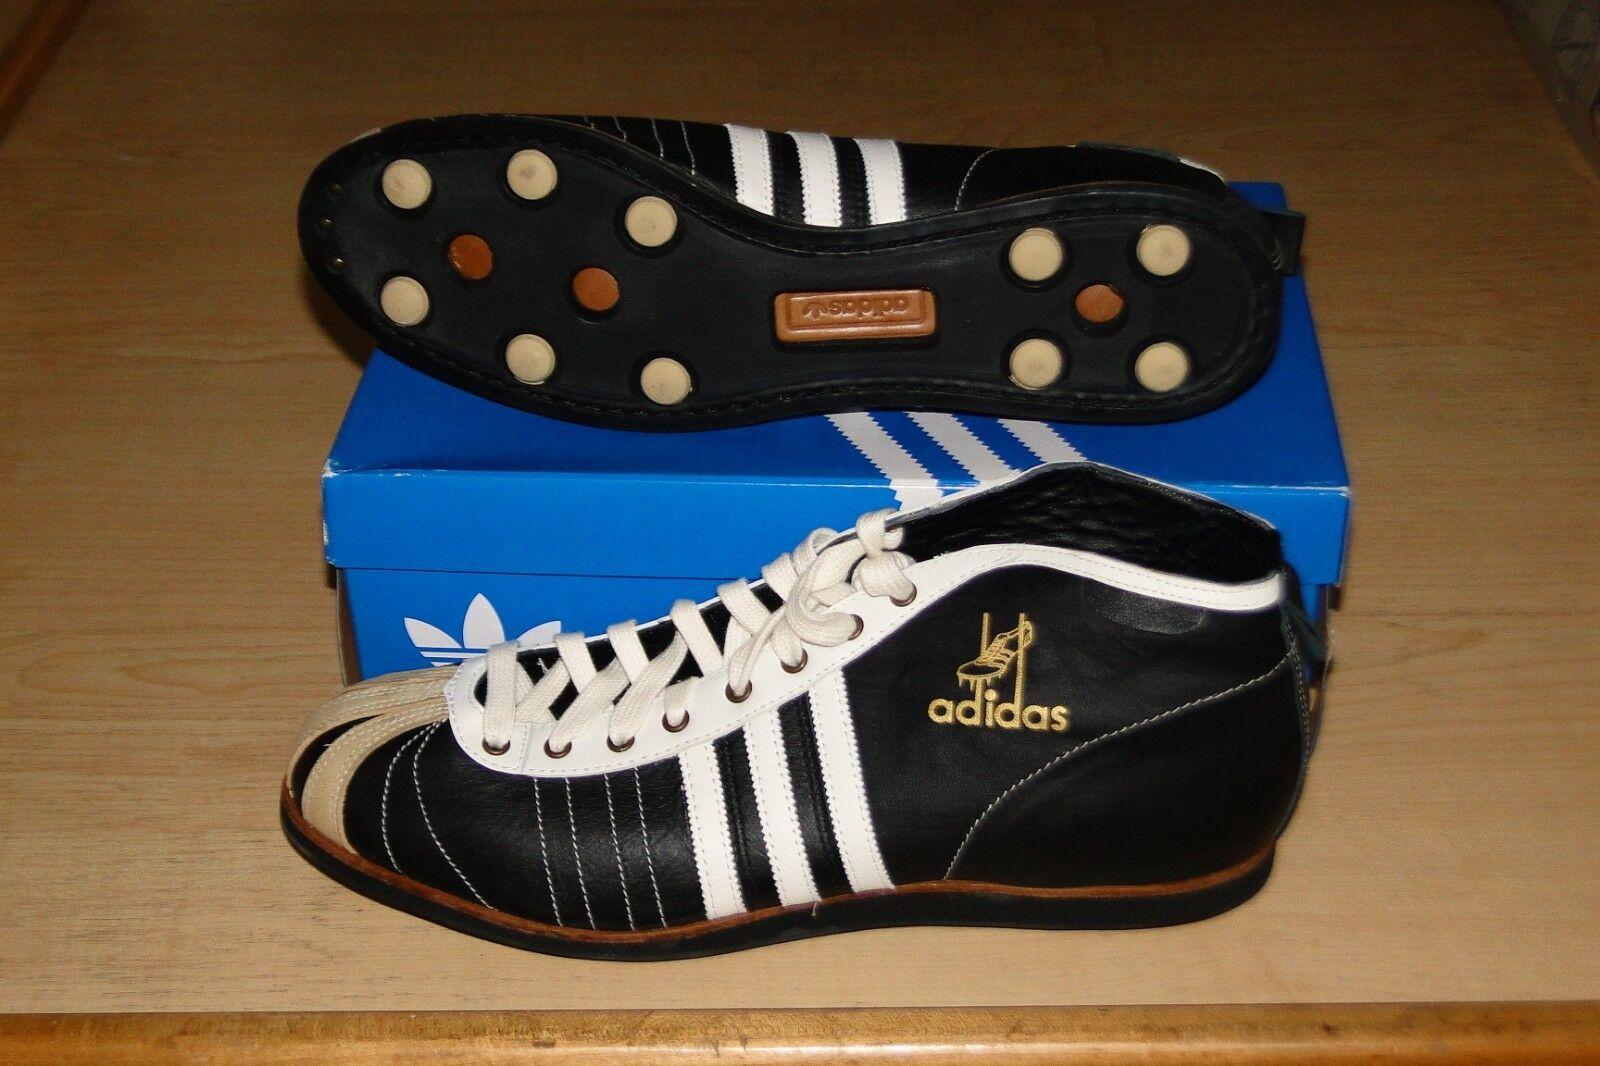 cuir noir et blanc blanc blanc rare adidas football soccer 54 superstar chaussure taille 14 | Belle Qualité  32d64c